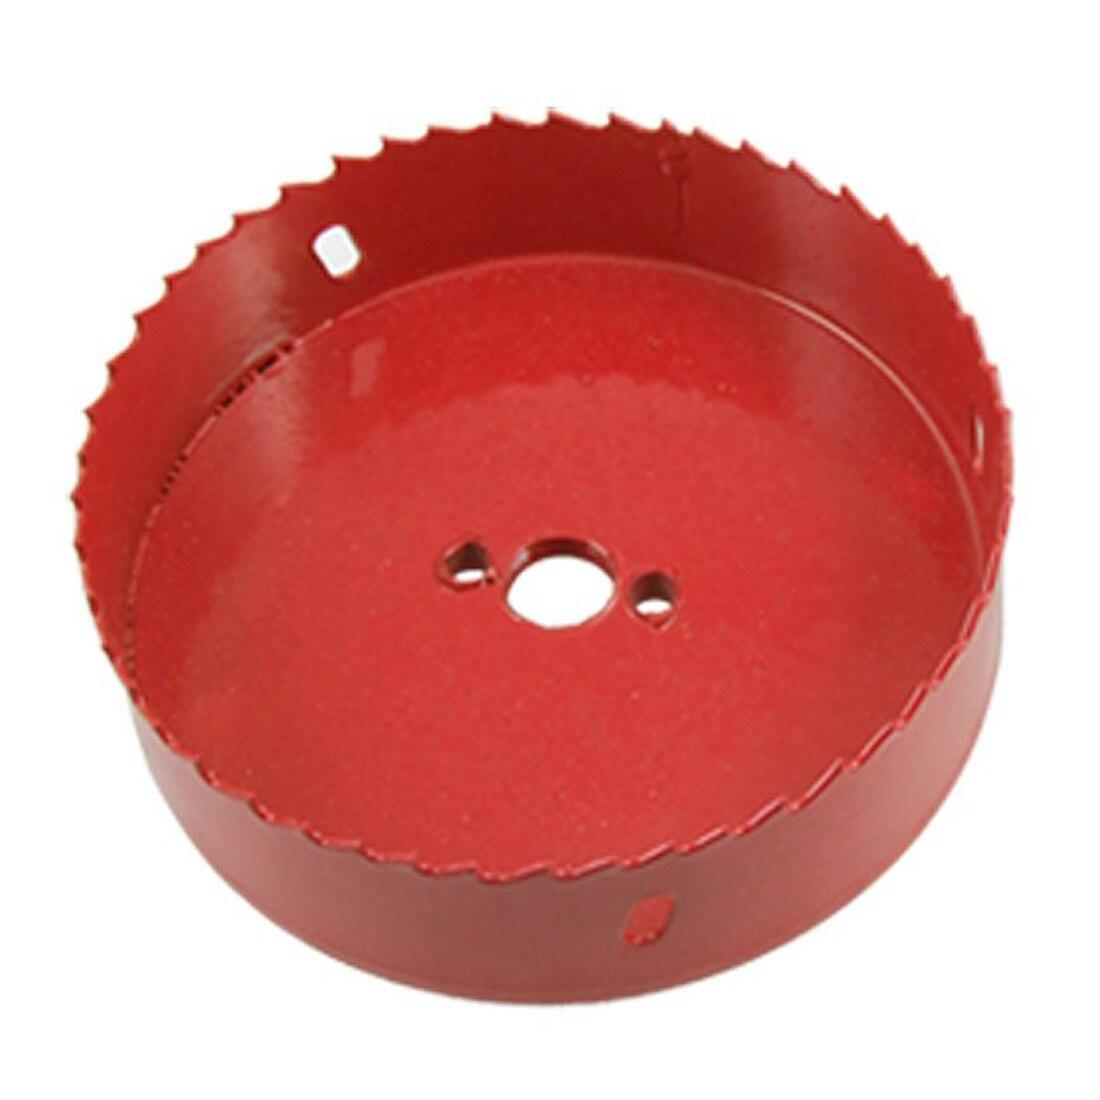 DHDL-120mm Diameter Bimetal Hole Cutter Cutting Holesaw Red<br><br>Aliexpress